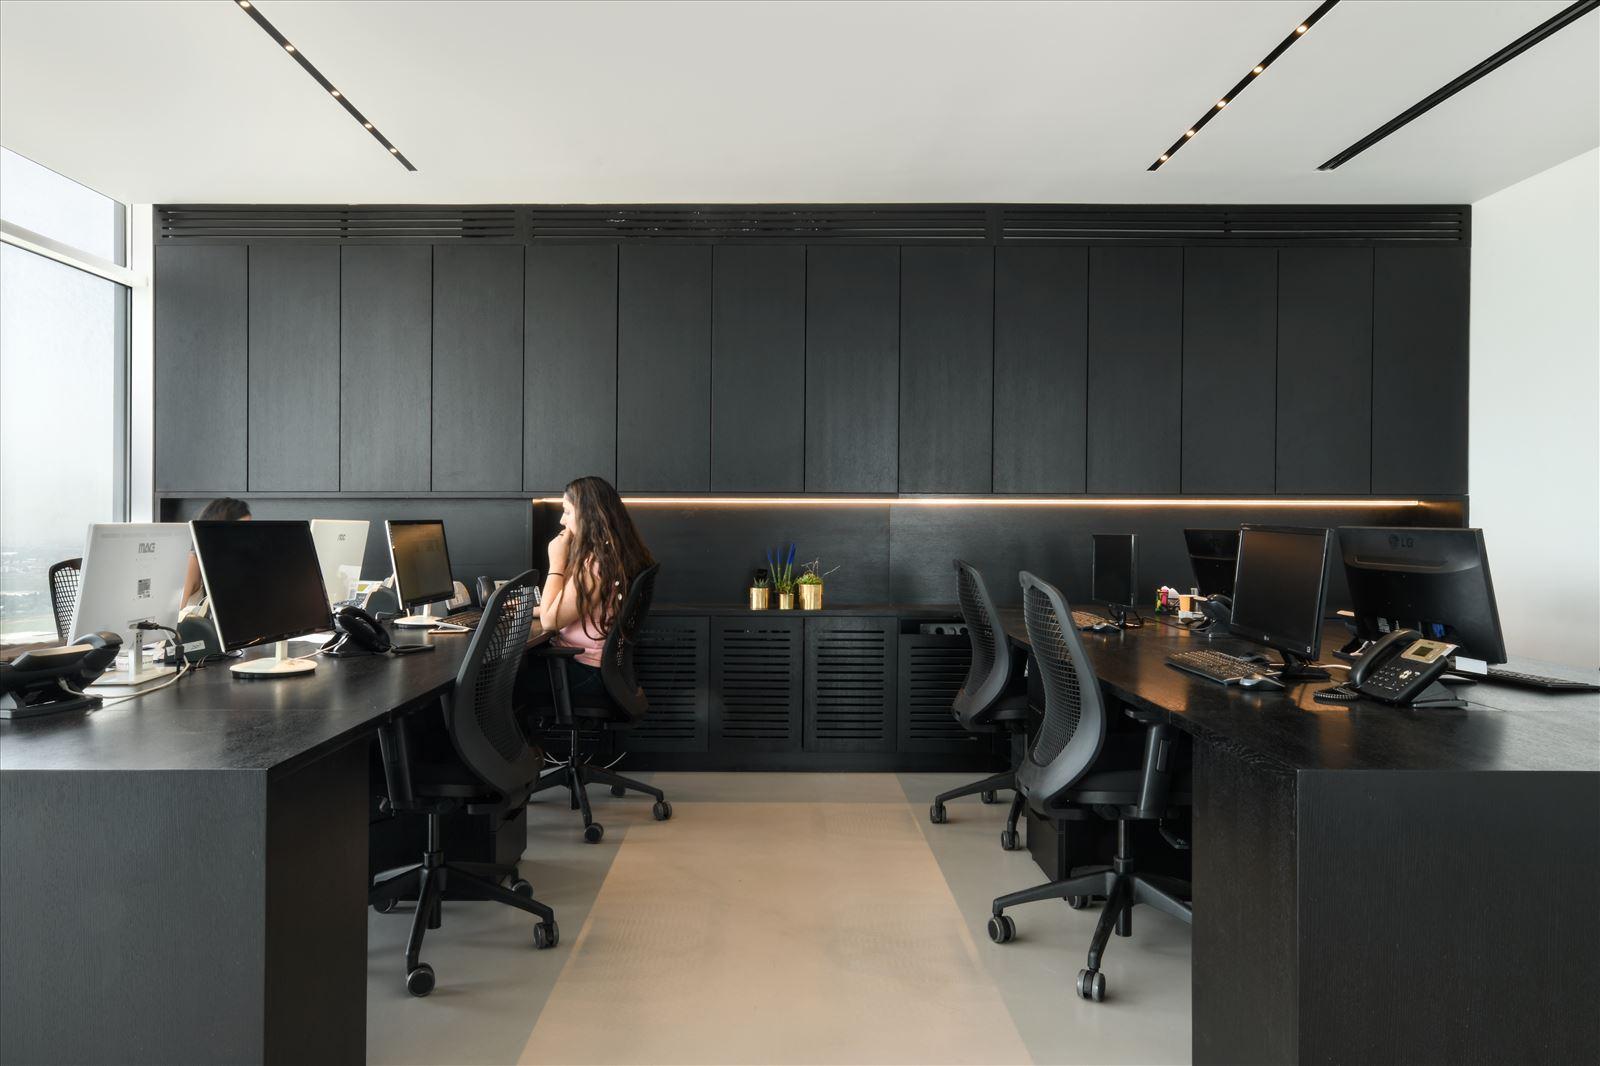 Divident office גוף תאורה בתוך ארונות המשרד נעשה על ידי קמחי תאורה